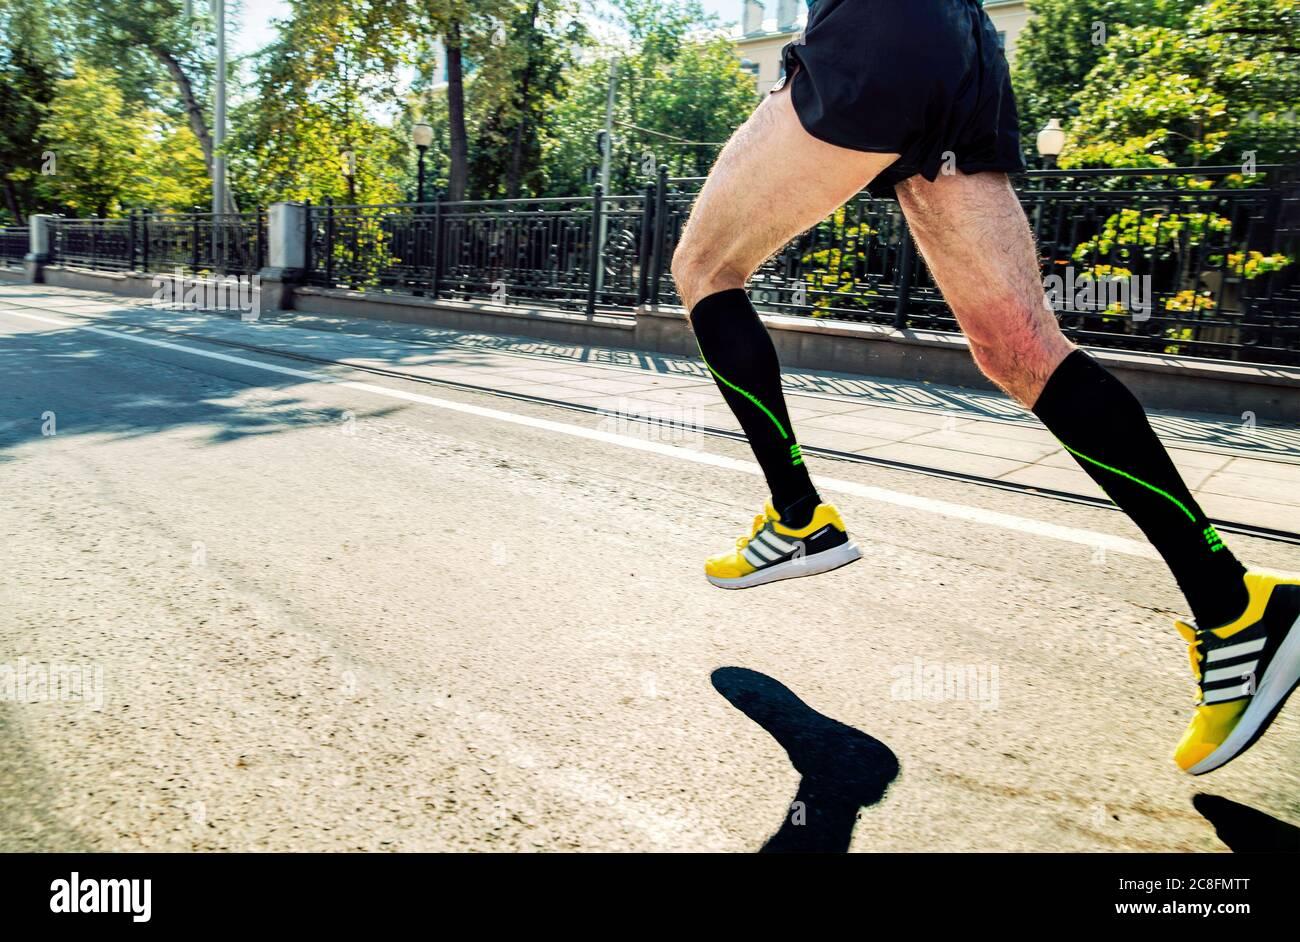 Ekaterinburg, Russia - August 7, 2016: legs man athlete runner in ...